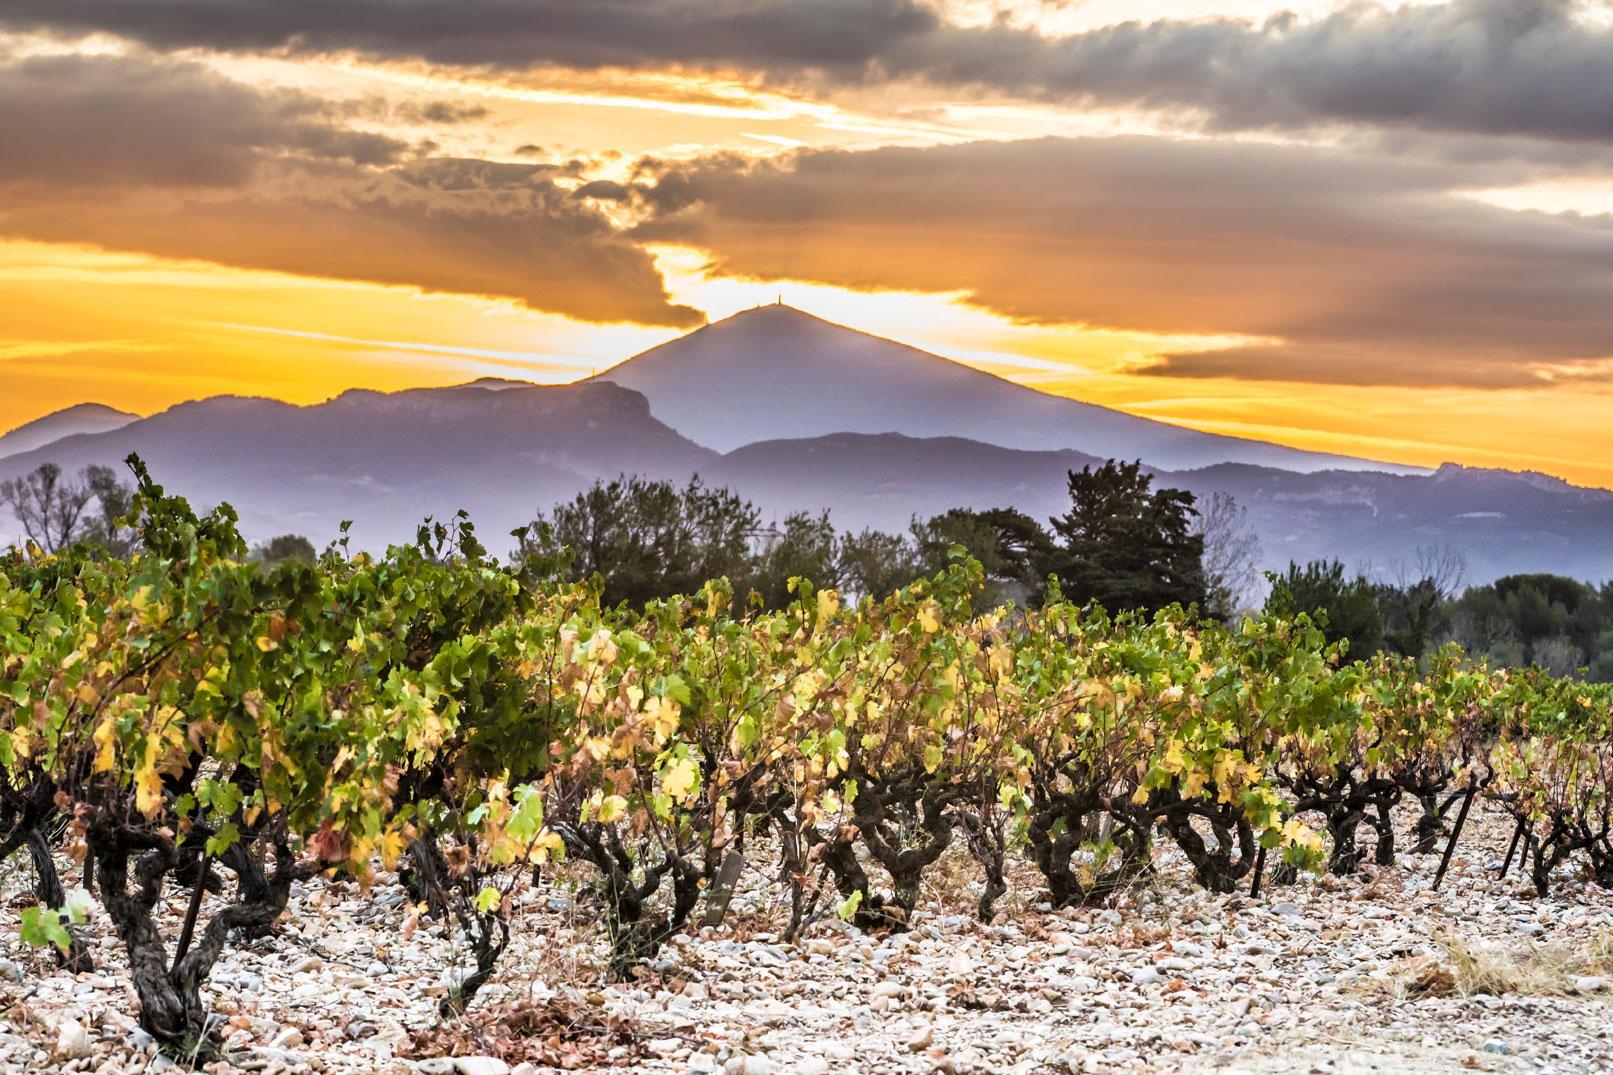 Vignobles de la vallée du Rhône - Kessler